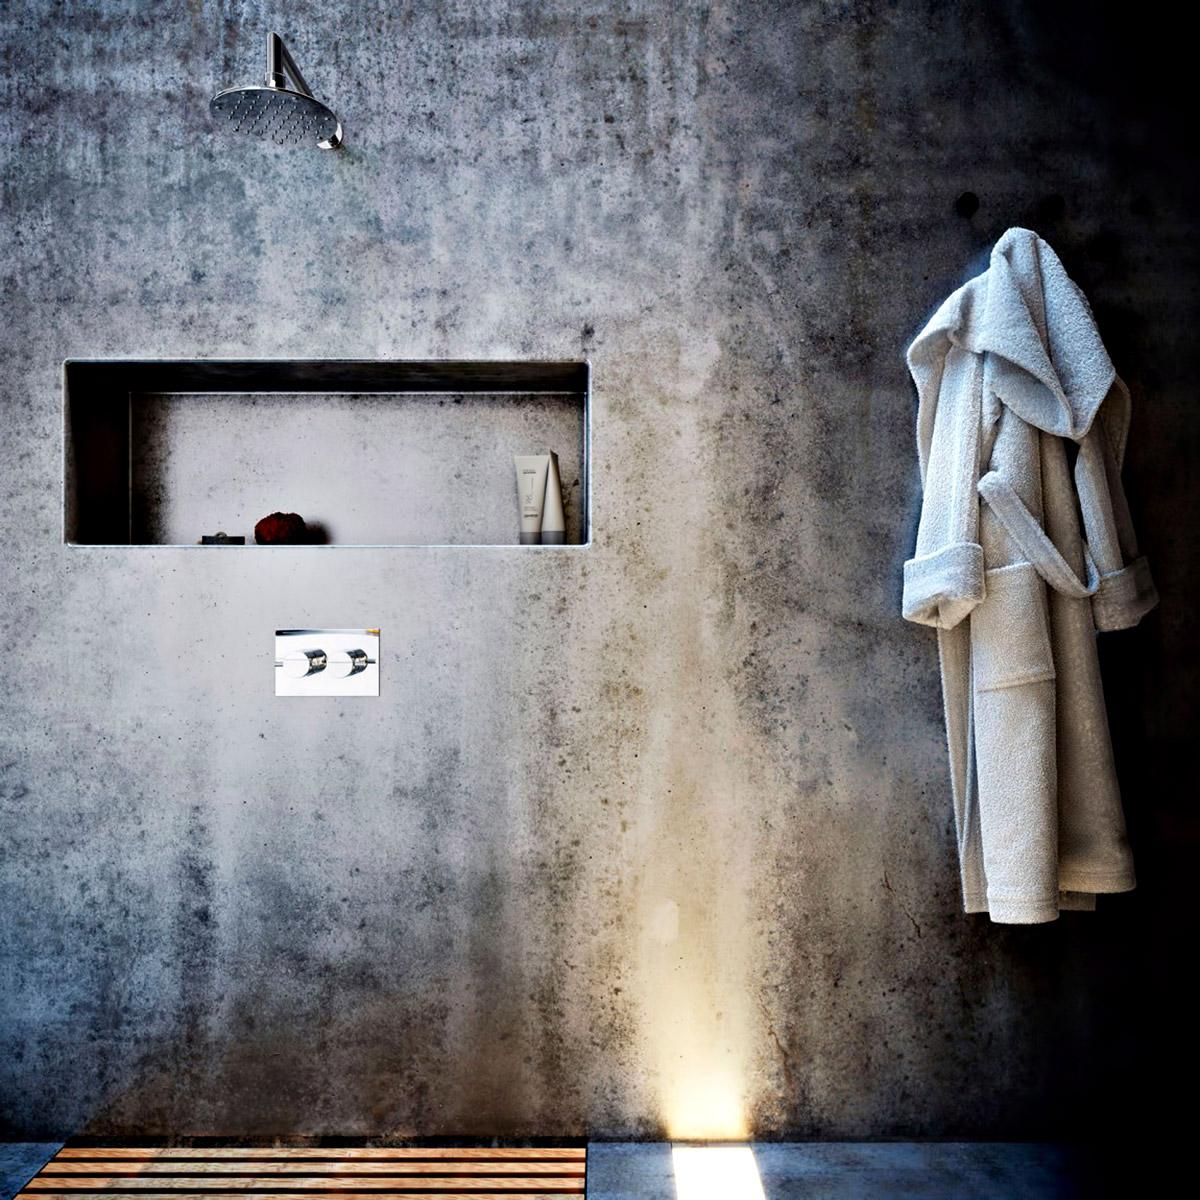 Bathroom - Ex Machina Film Inspires Architecture for a Writer's Modern Concrete Home Design